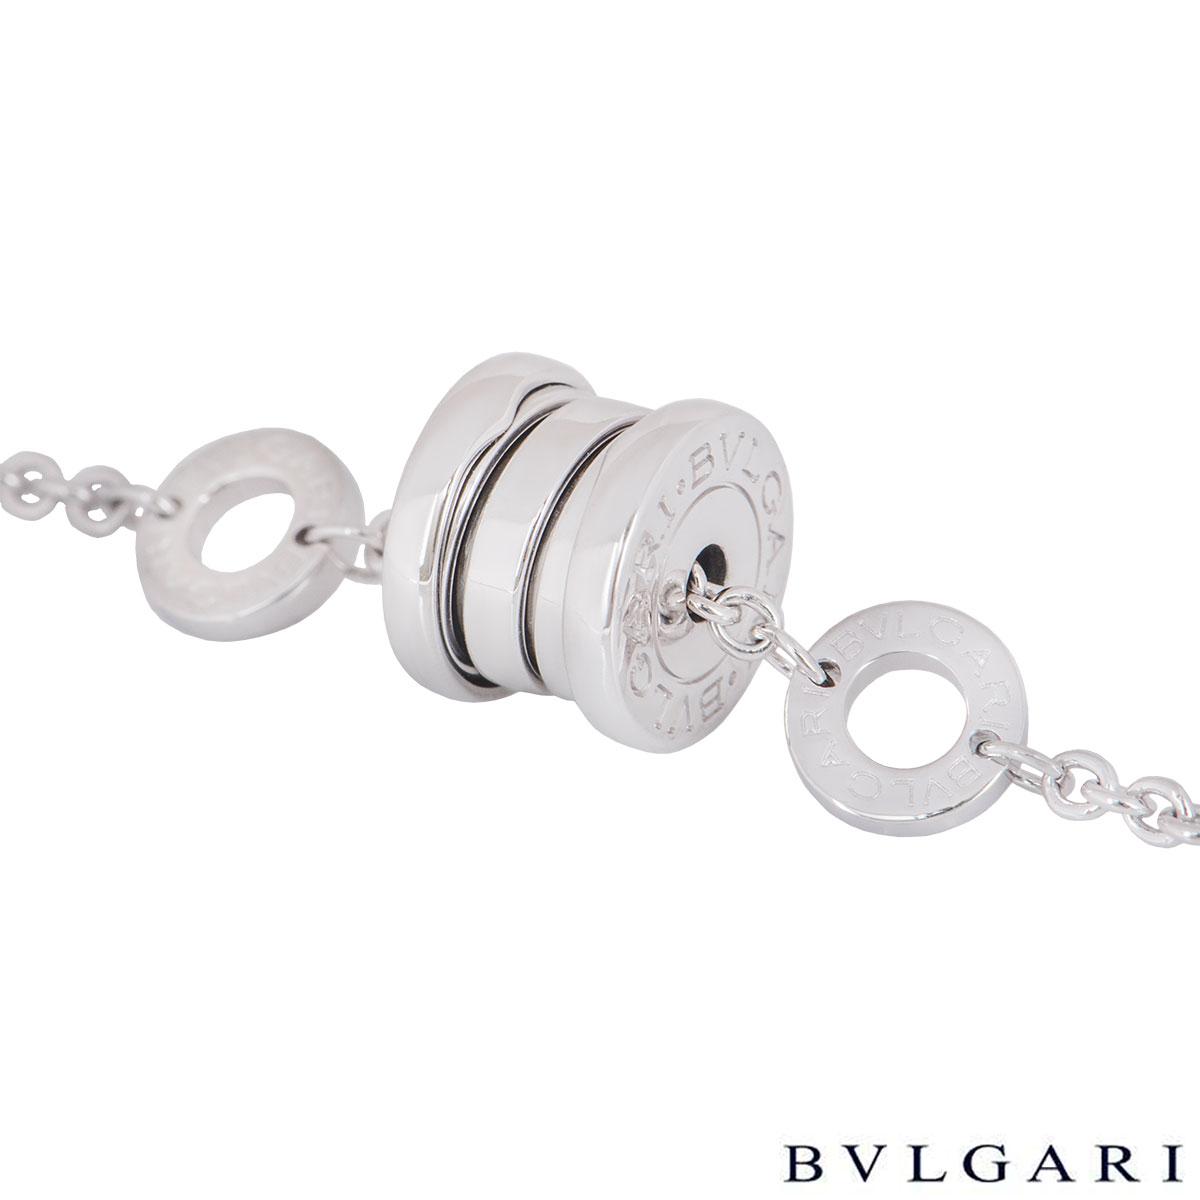 Bvlgari White Gold B.zero1 Bracelet BR853720